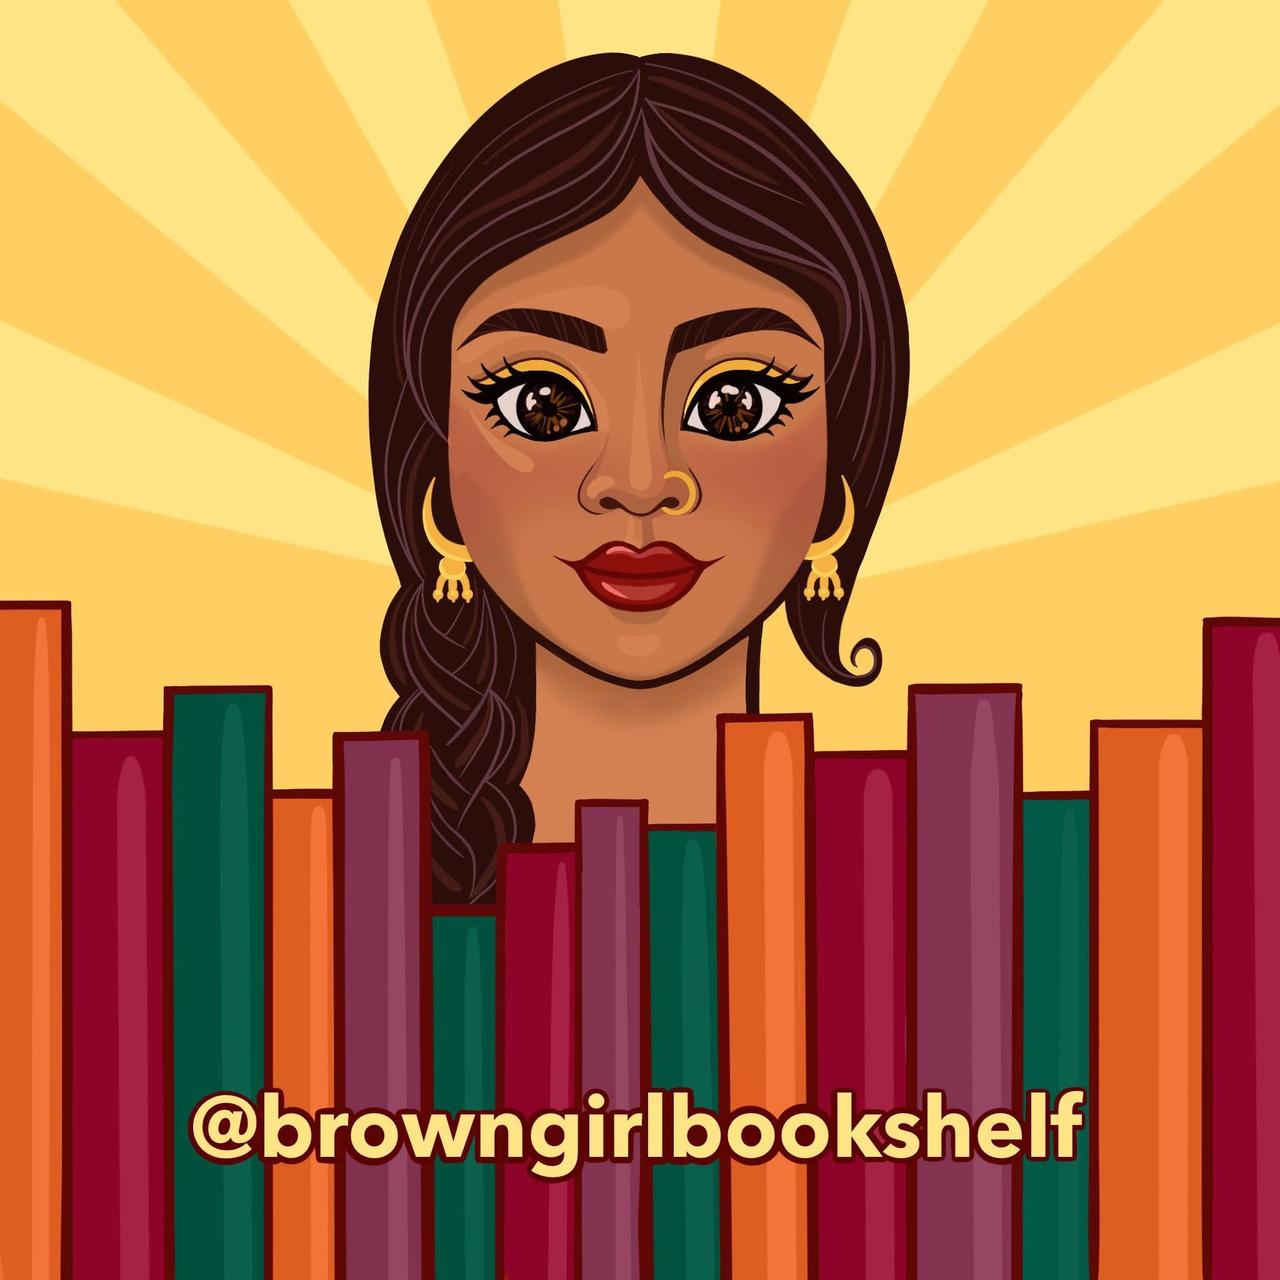 Brown Girl Bookshelf